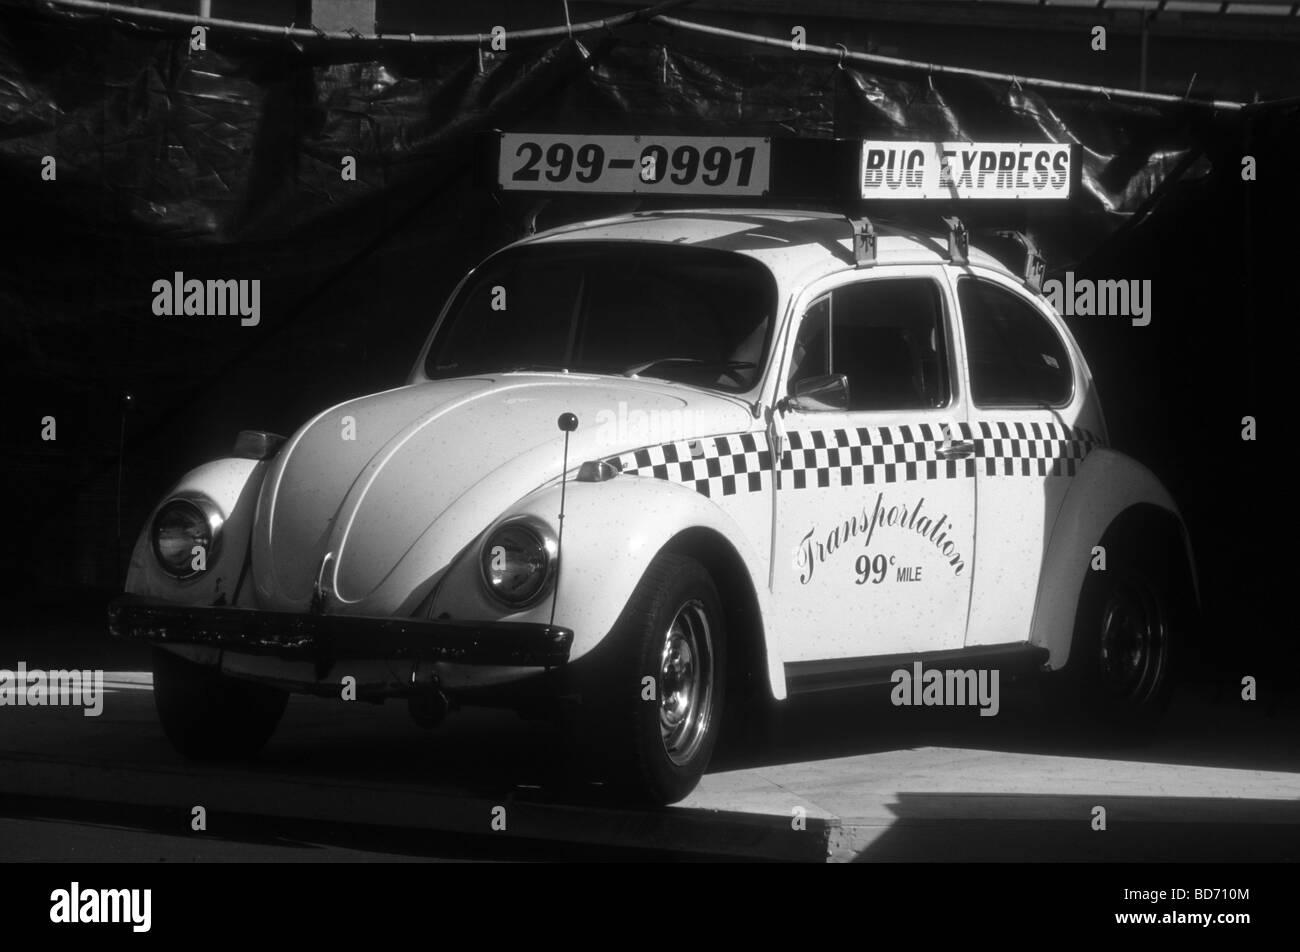 Classic VW Beetle Taxi in California - Stock Image